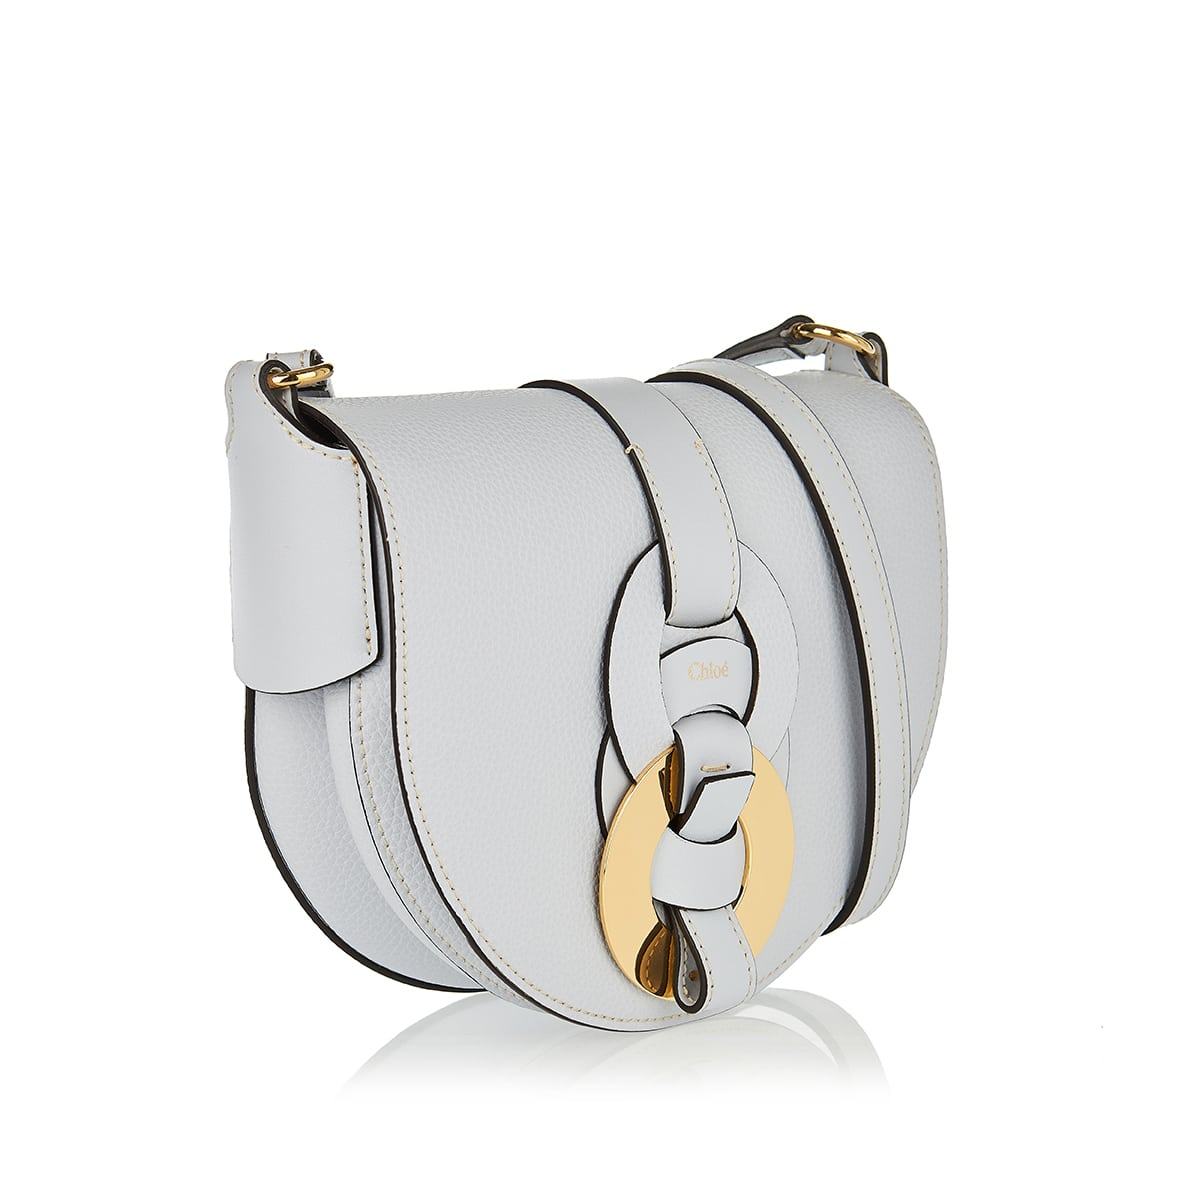 Darryl Small saddle bag